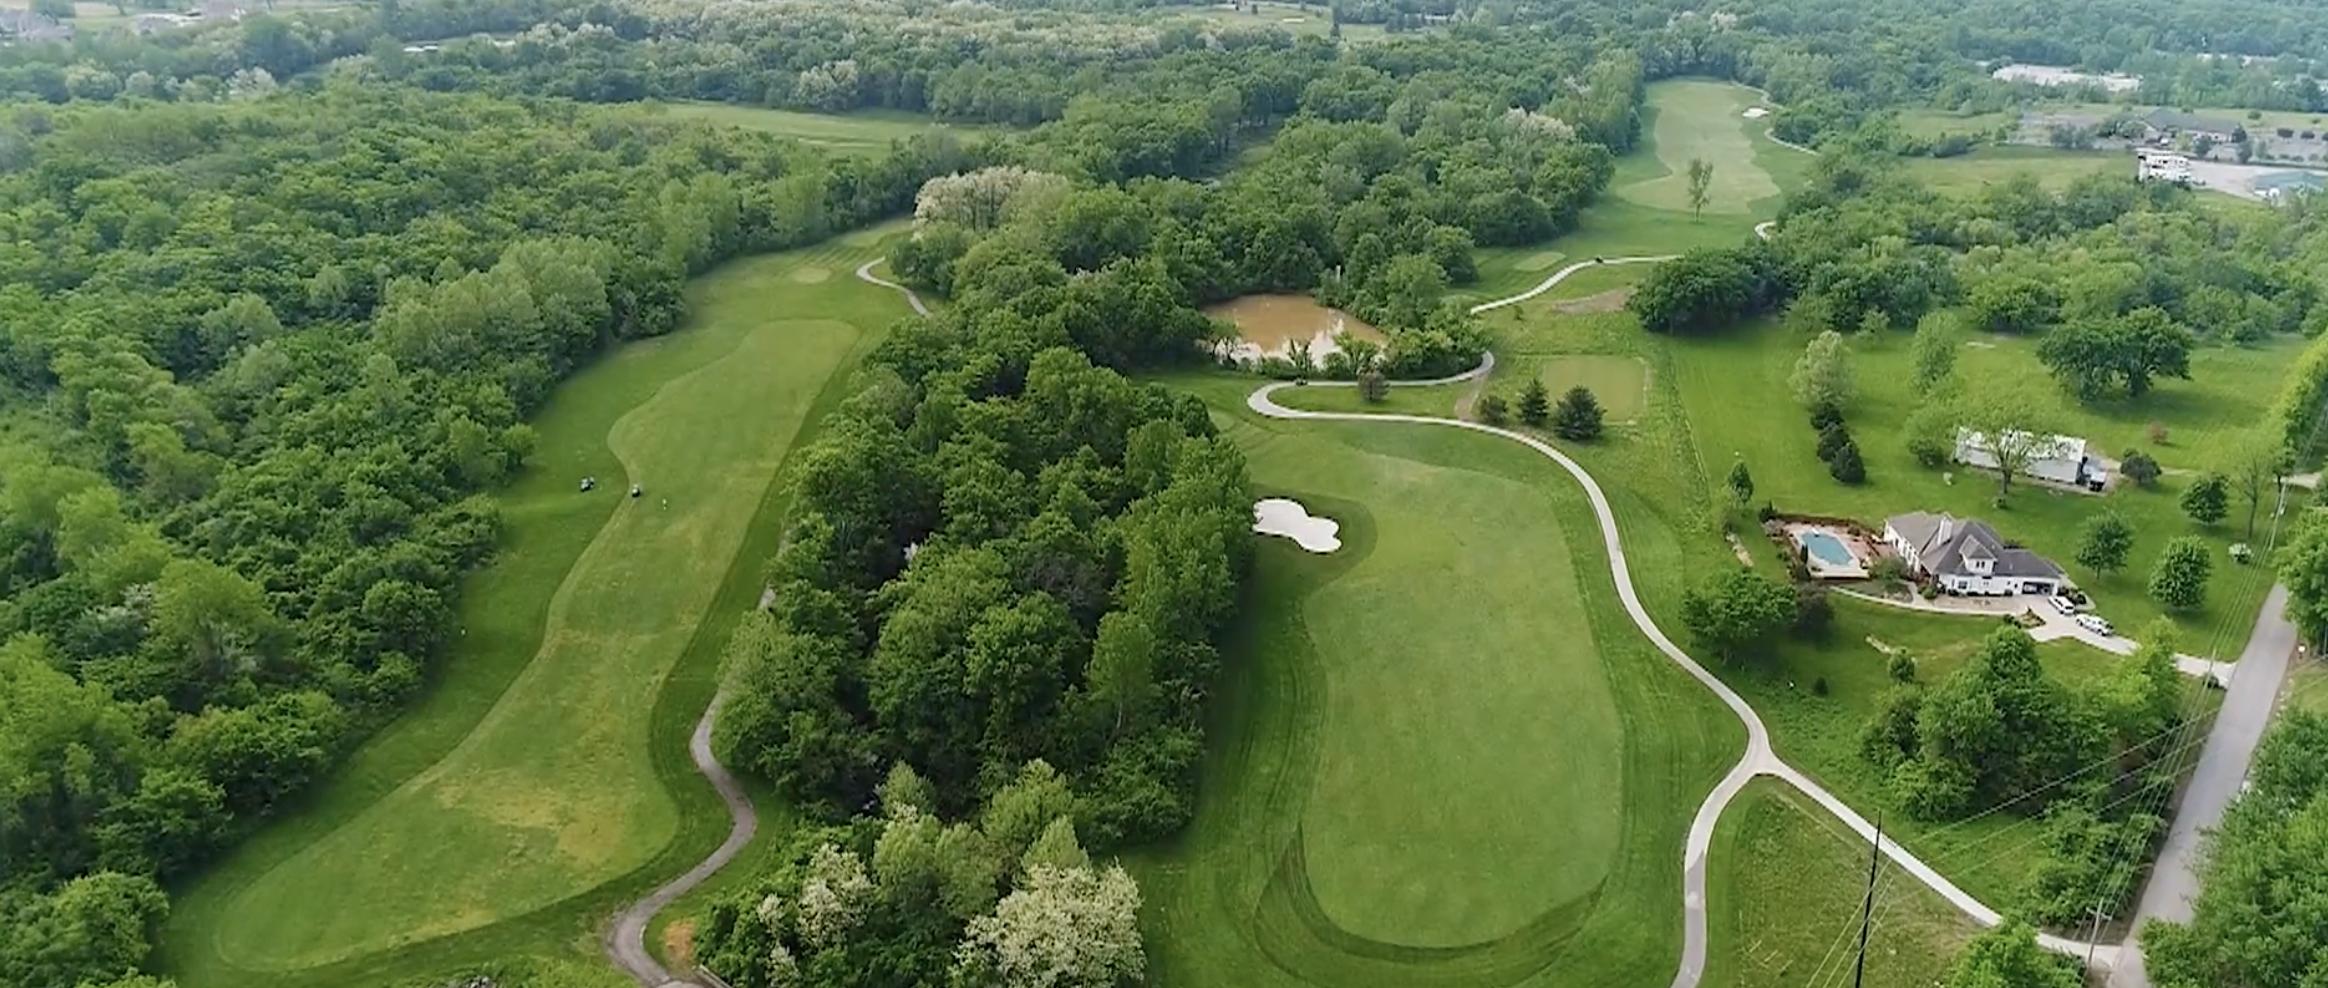 The Course - Adams Pointe Golf Club1601 R D Mize RdBlue Springs, MO 64014